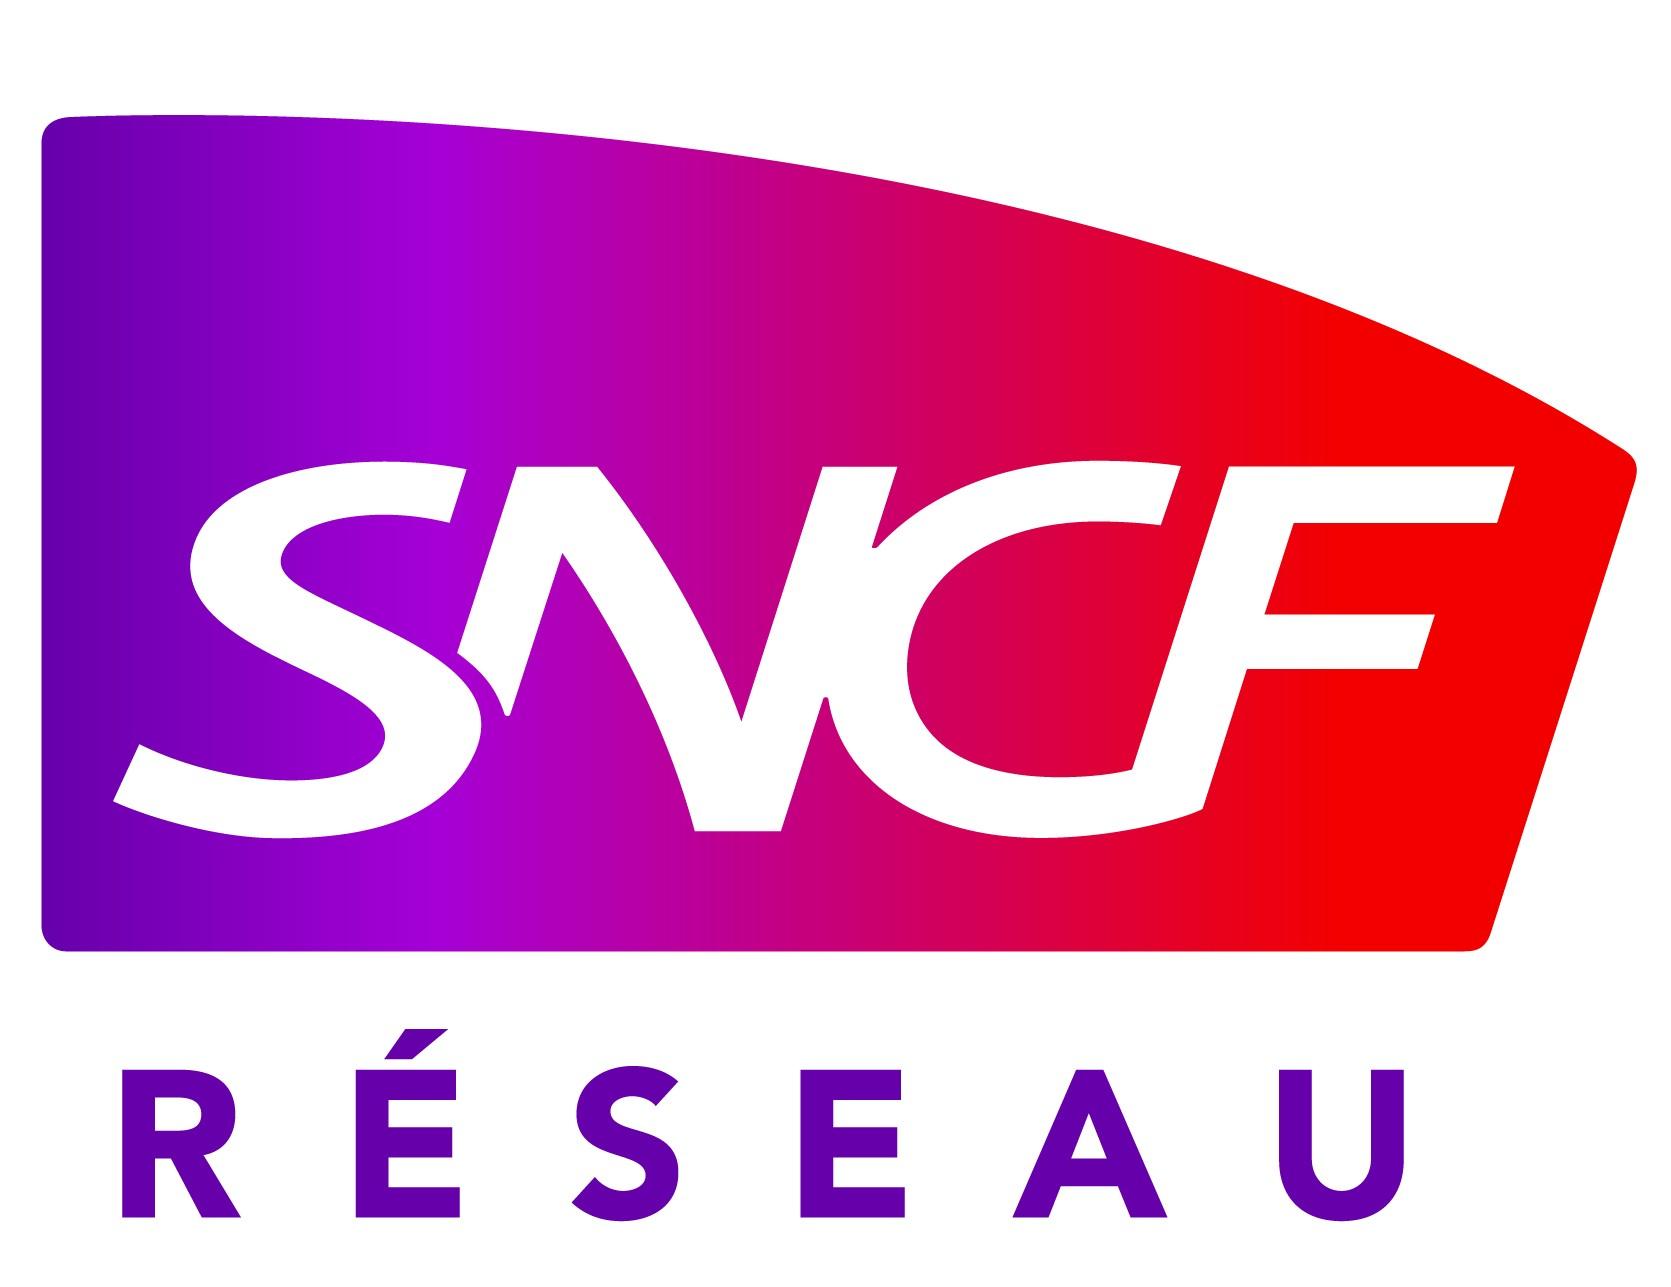 92593_vignette_LOGO-SNCF-RESEAU-CMJN-01-1-